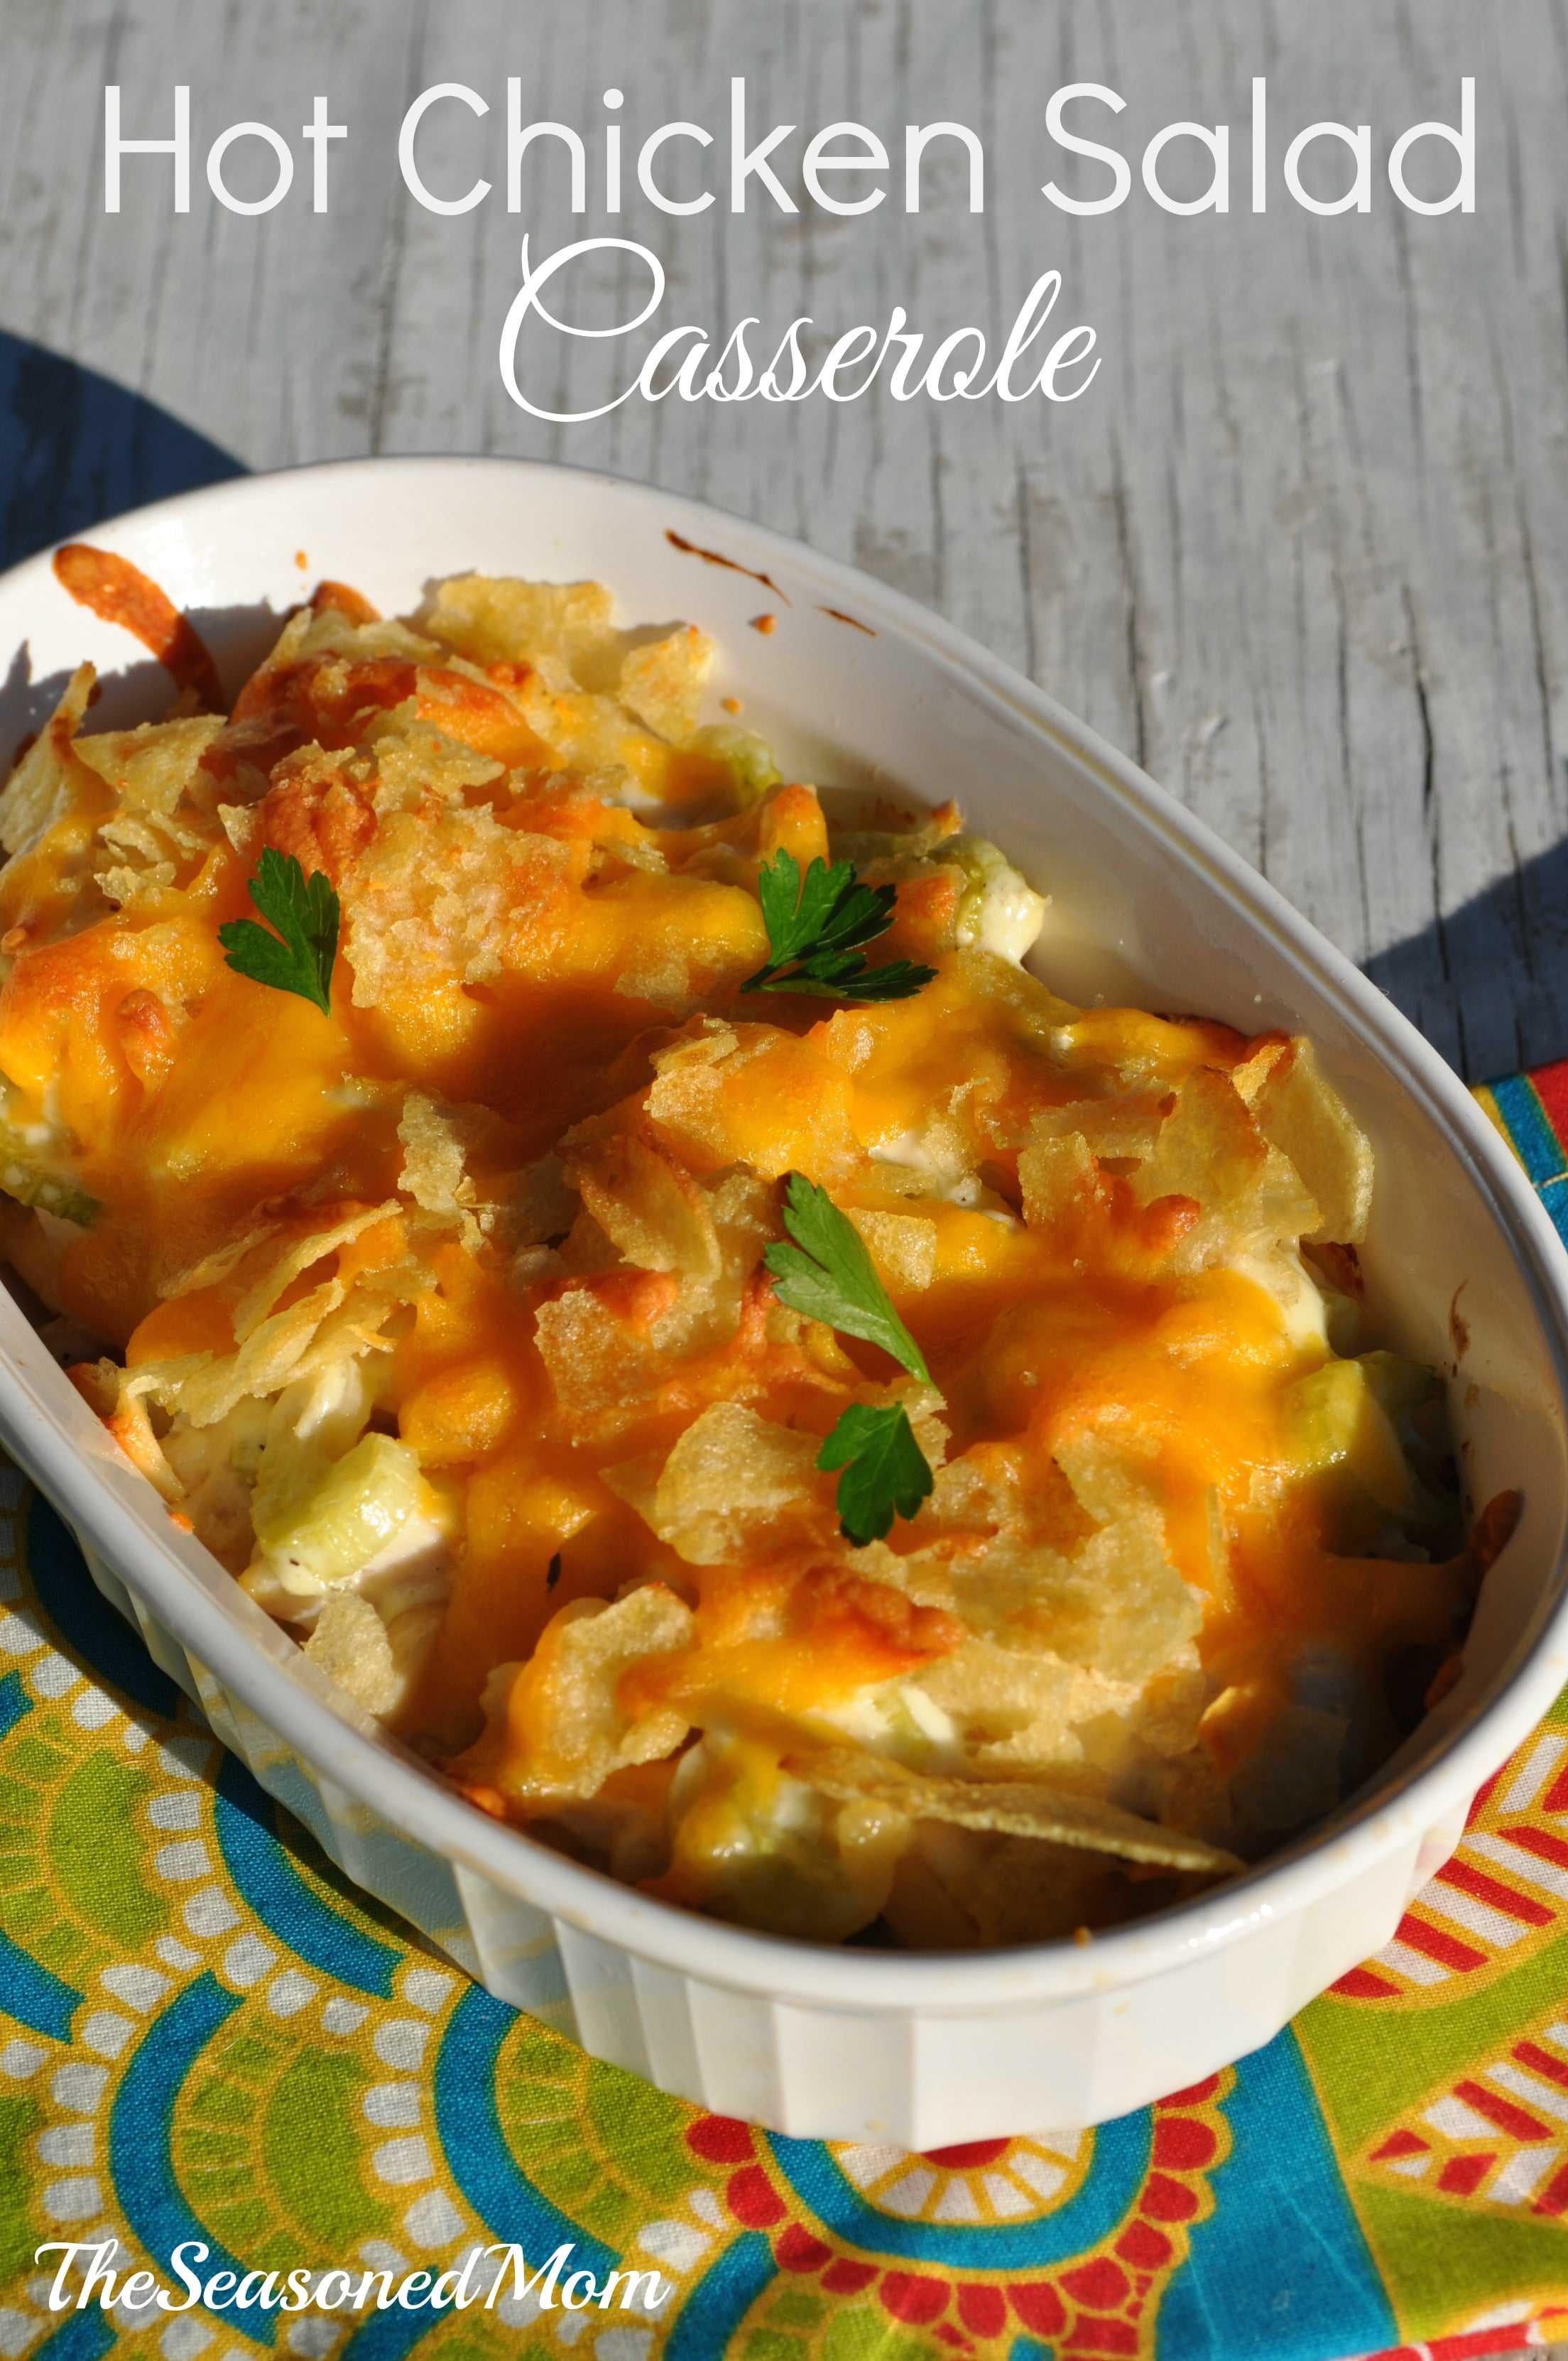 Hot Chicken Salad Casserole  Hot Chicken Salad Casserole The Seasoned Mom